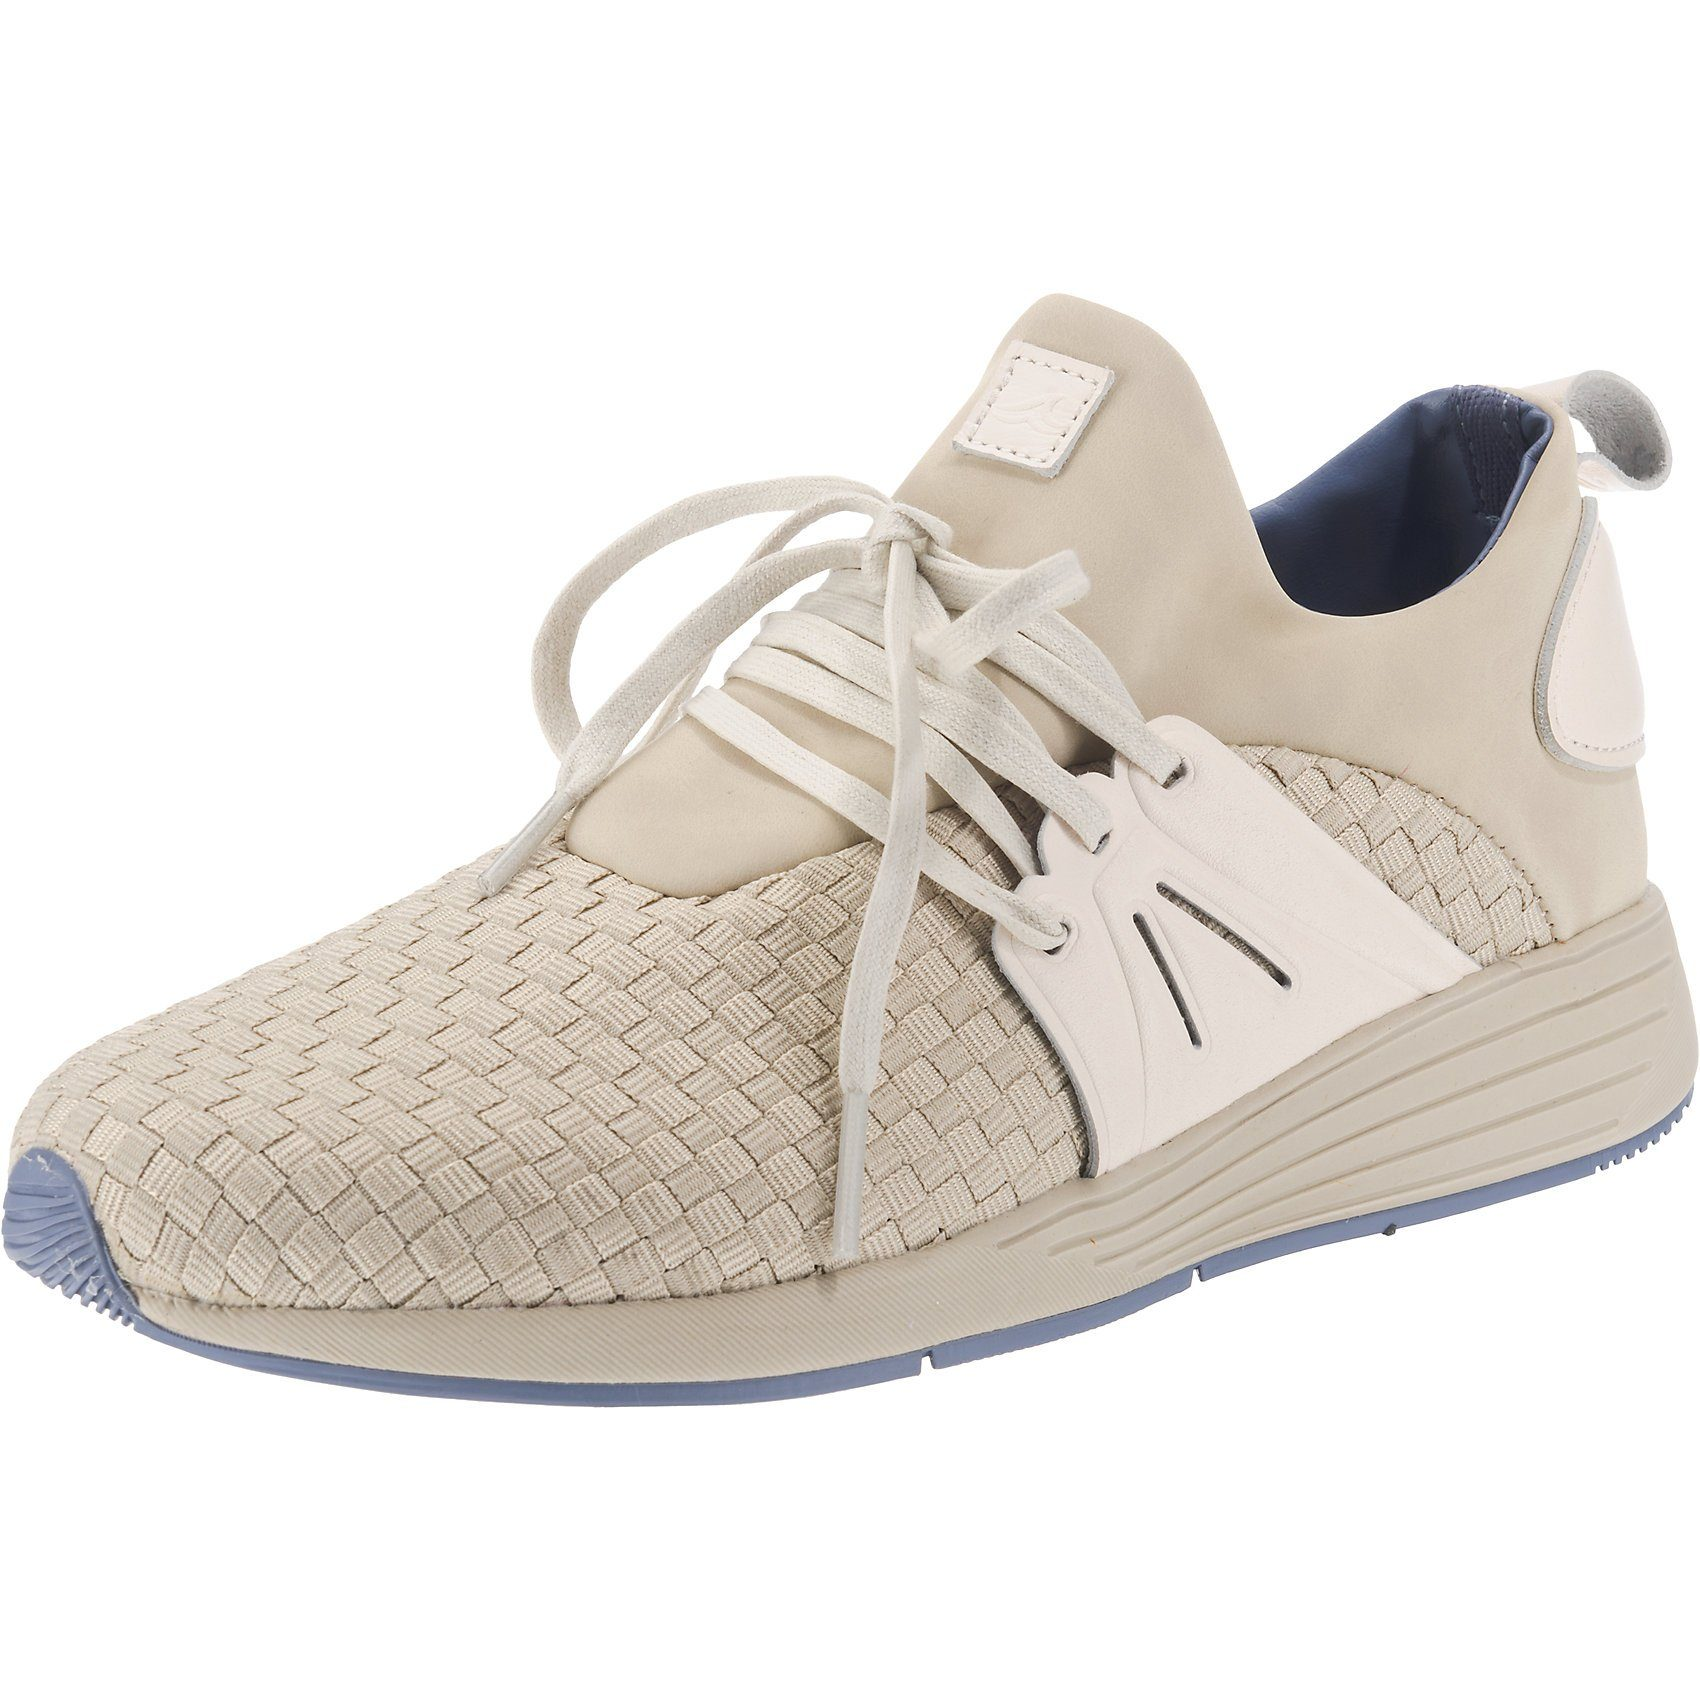 Project Delray Wavey Sneakers Low online kaufen  creme